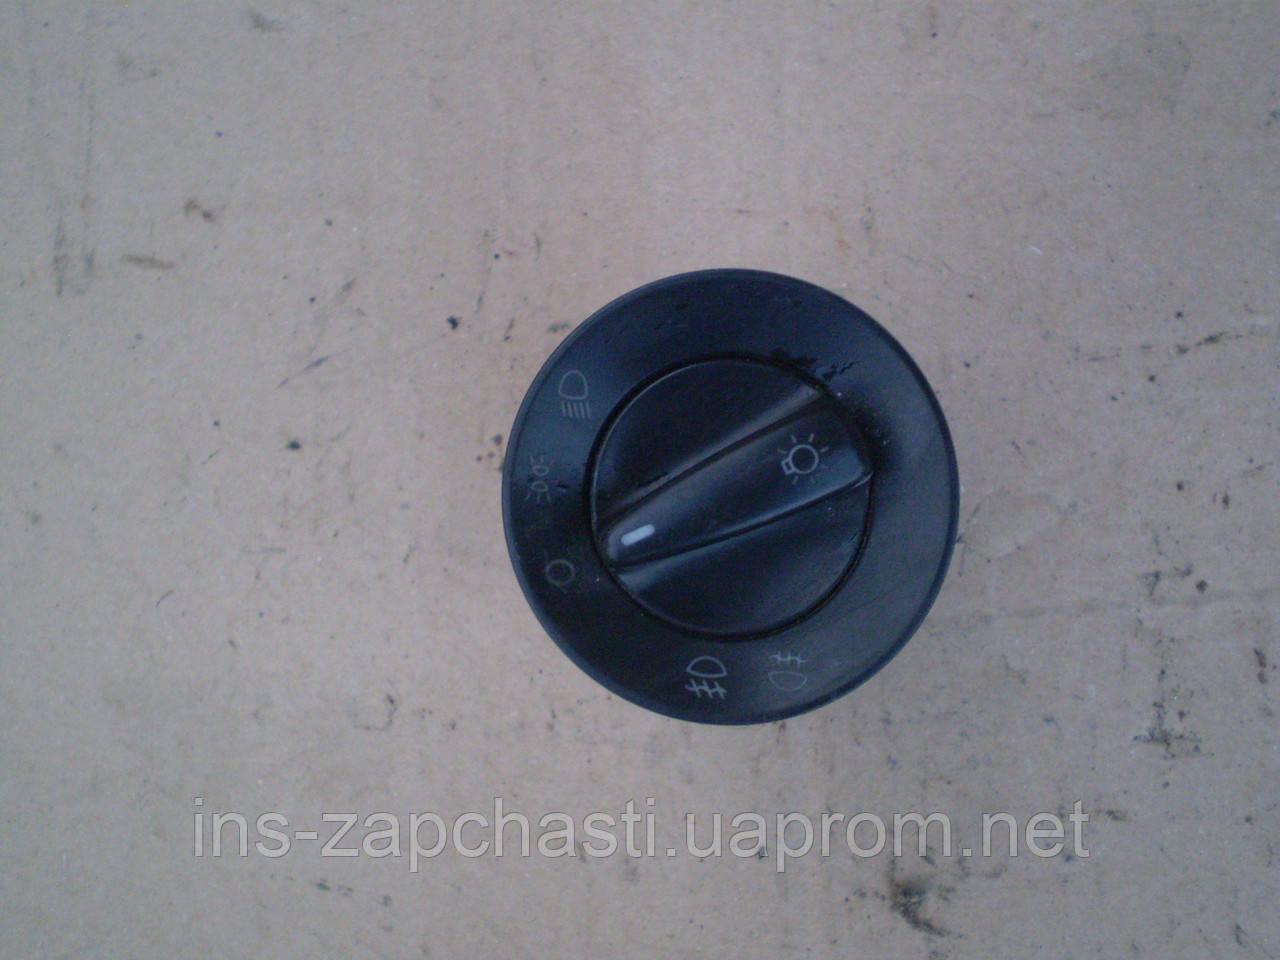 1C0941531AПереключатель многопоз. для стоян. света и светафар, передн. и задн. противотум. фар SEAT VOLKSWAGEN